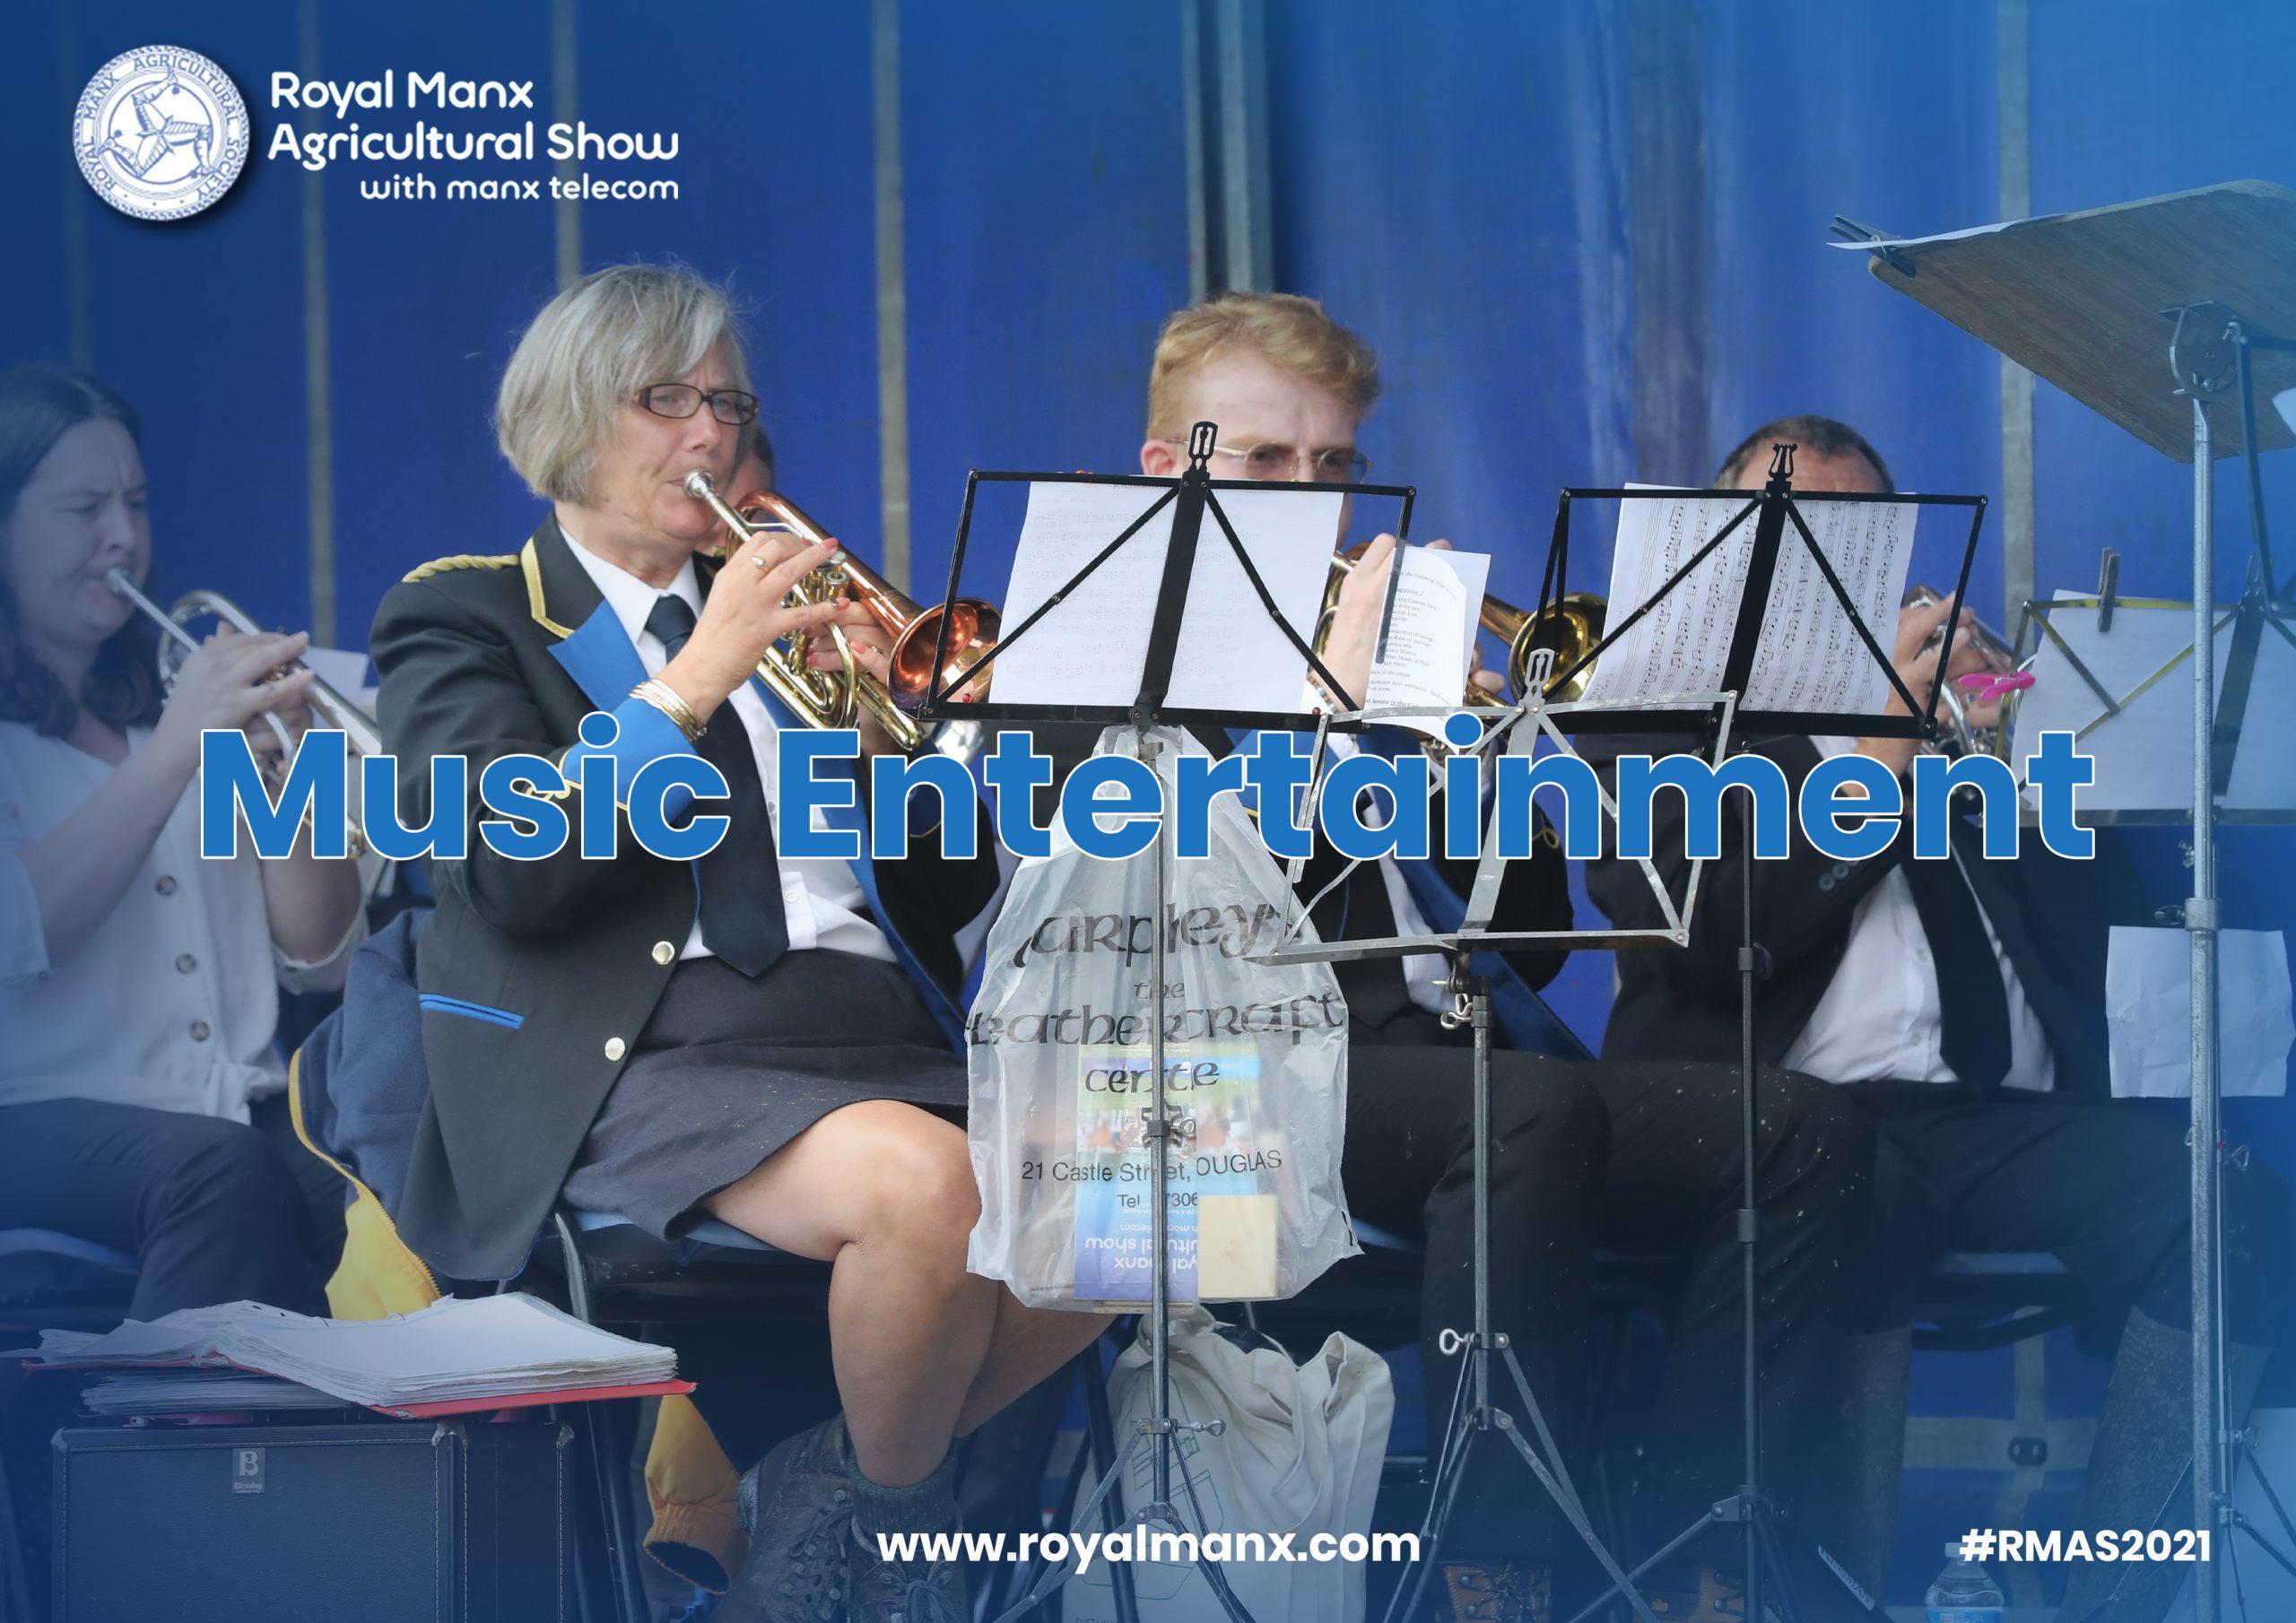 Music Entertainment